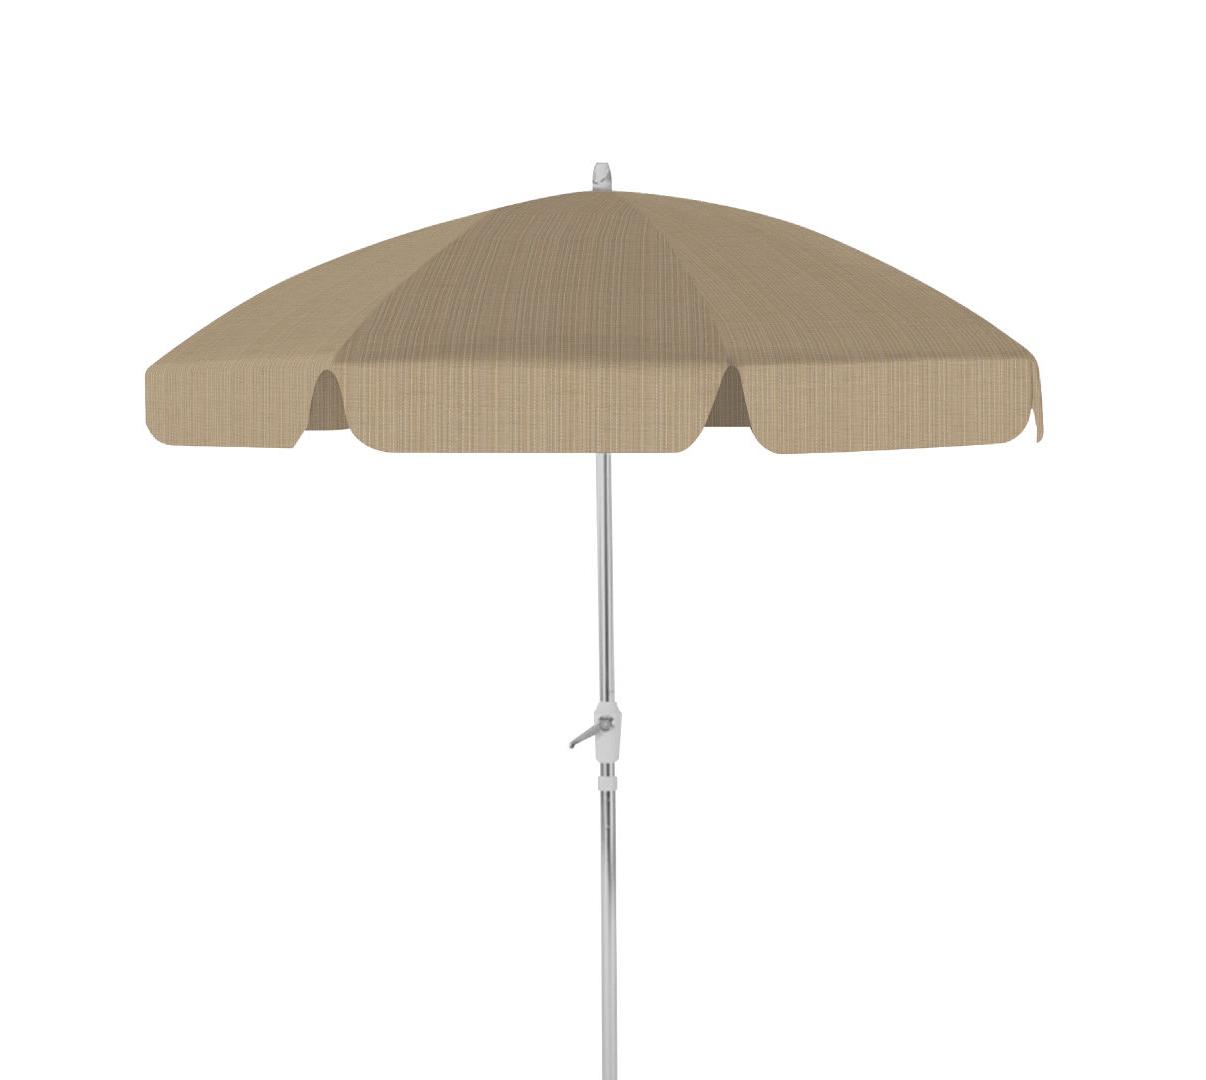 2019 Drape Umbrellas Throughout Drape Umbrella 7 1/2' 8 Rib Drape Umbrella With Tilttelescope Casual (View 3 of 20)